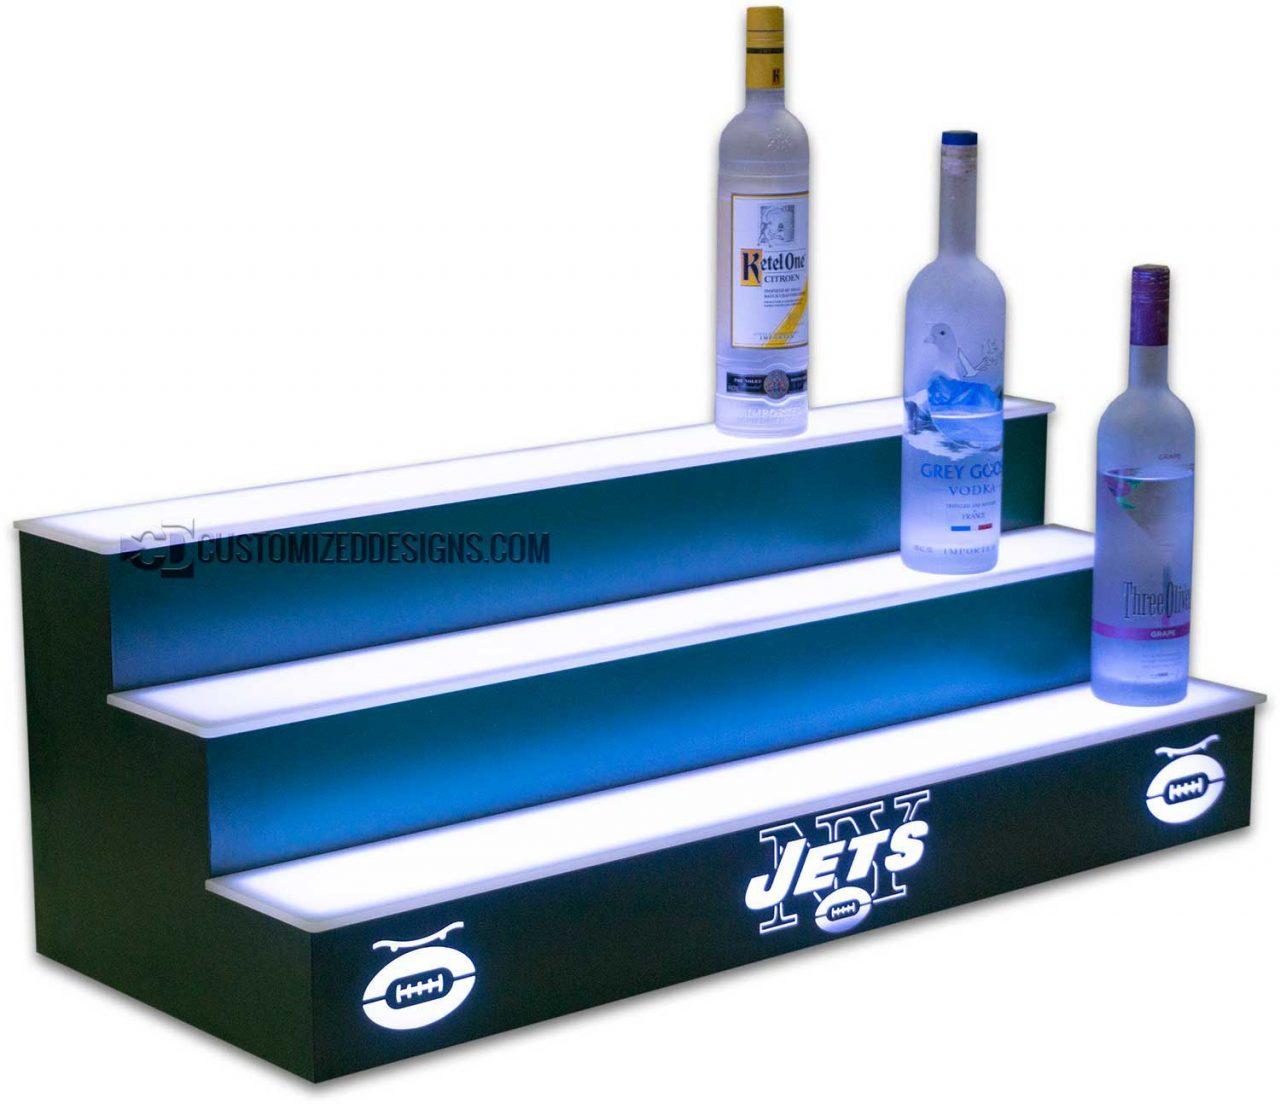 New York Jets Liquor Display w/ Hunter Green Finish